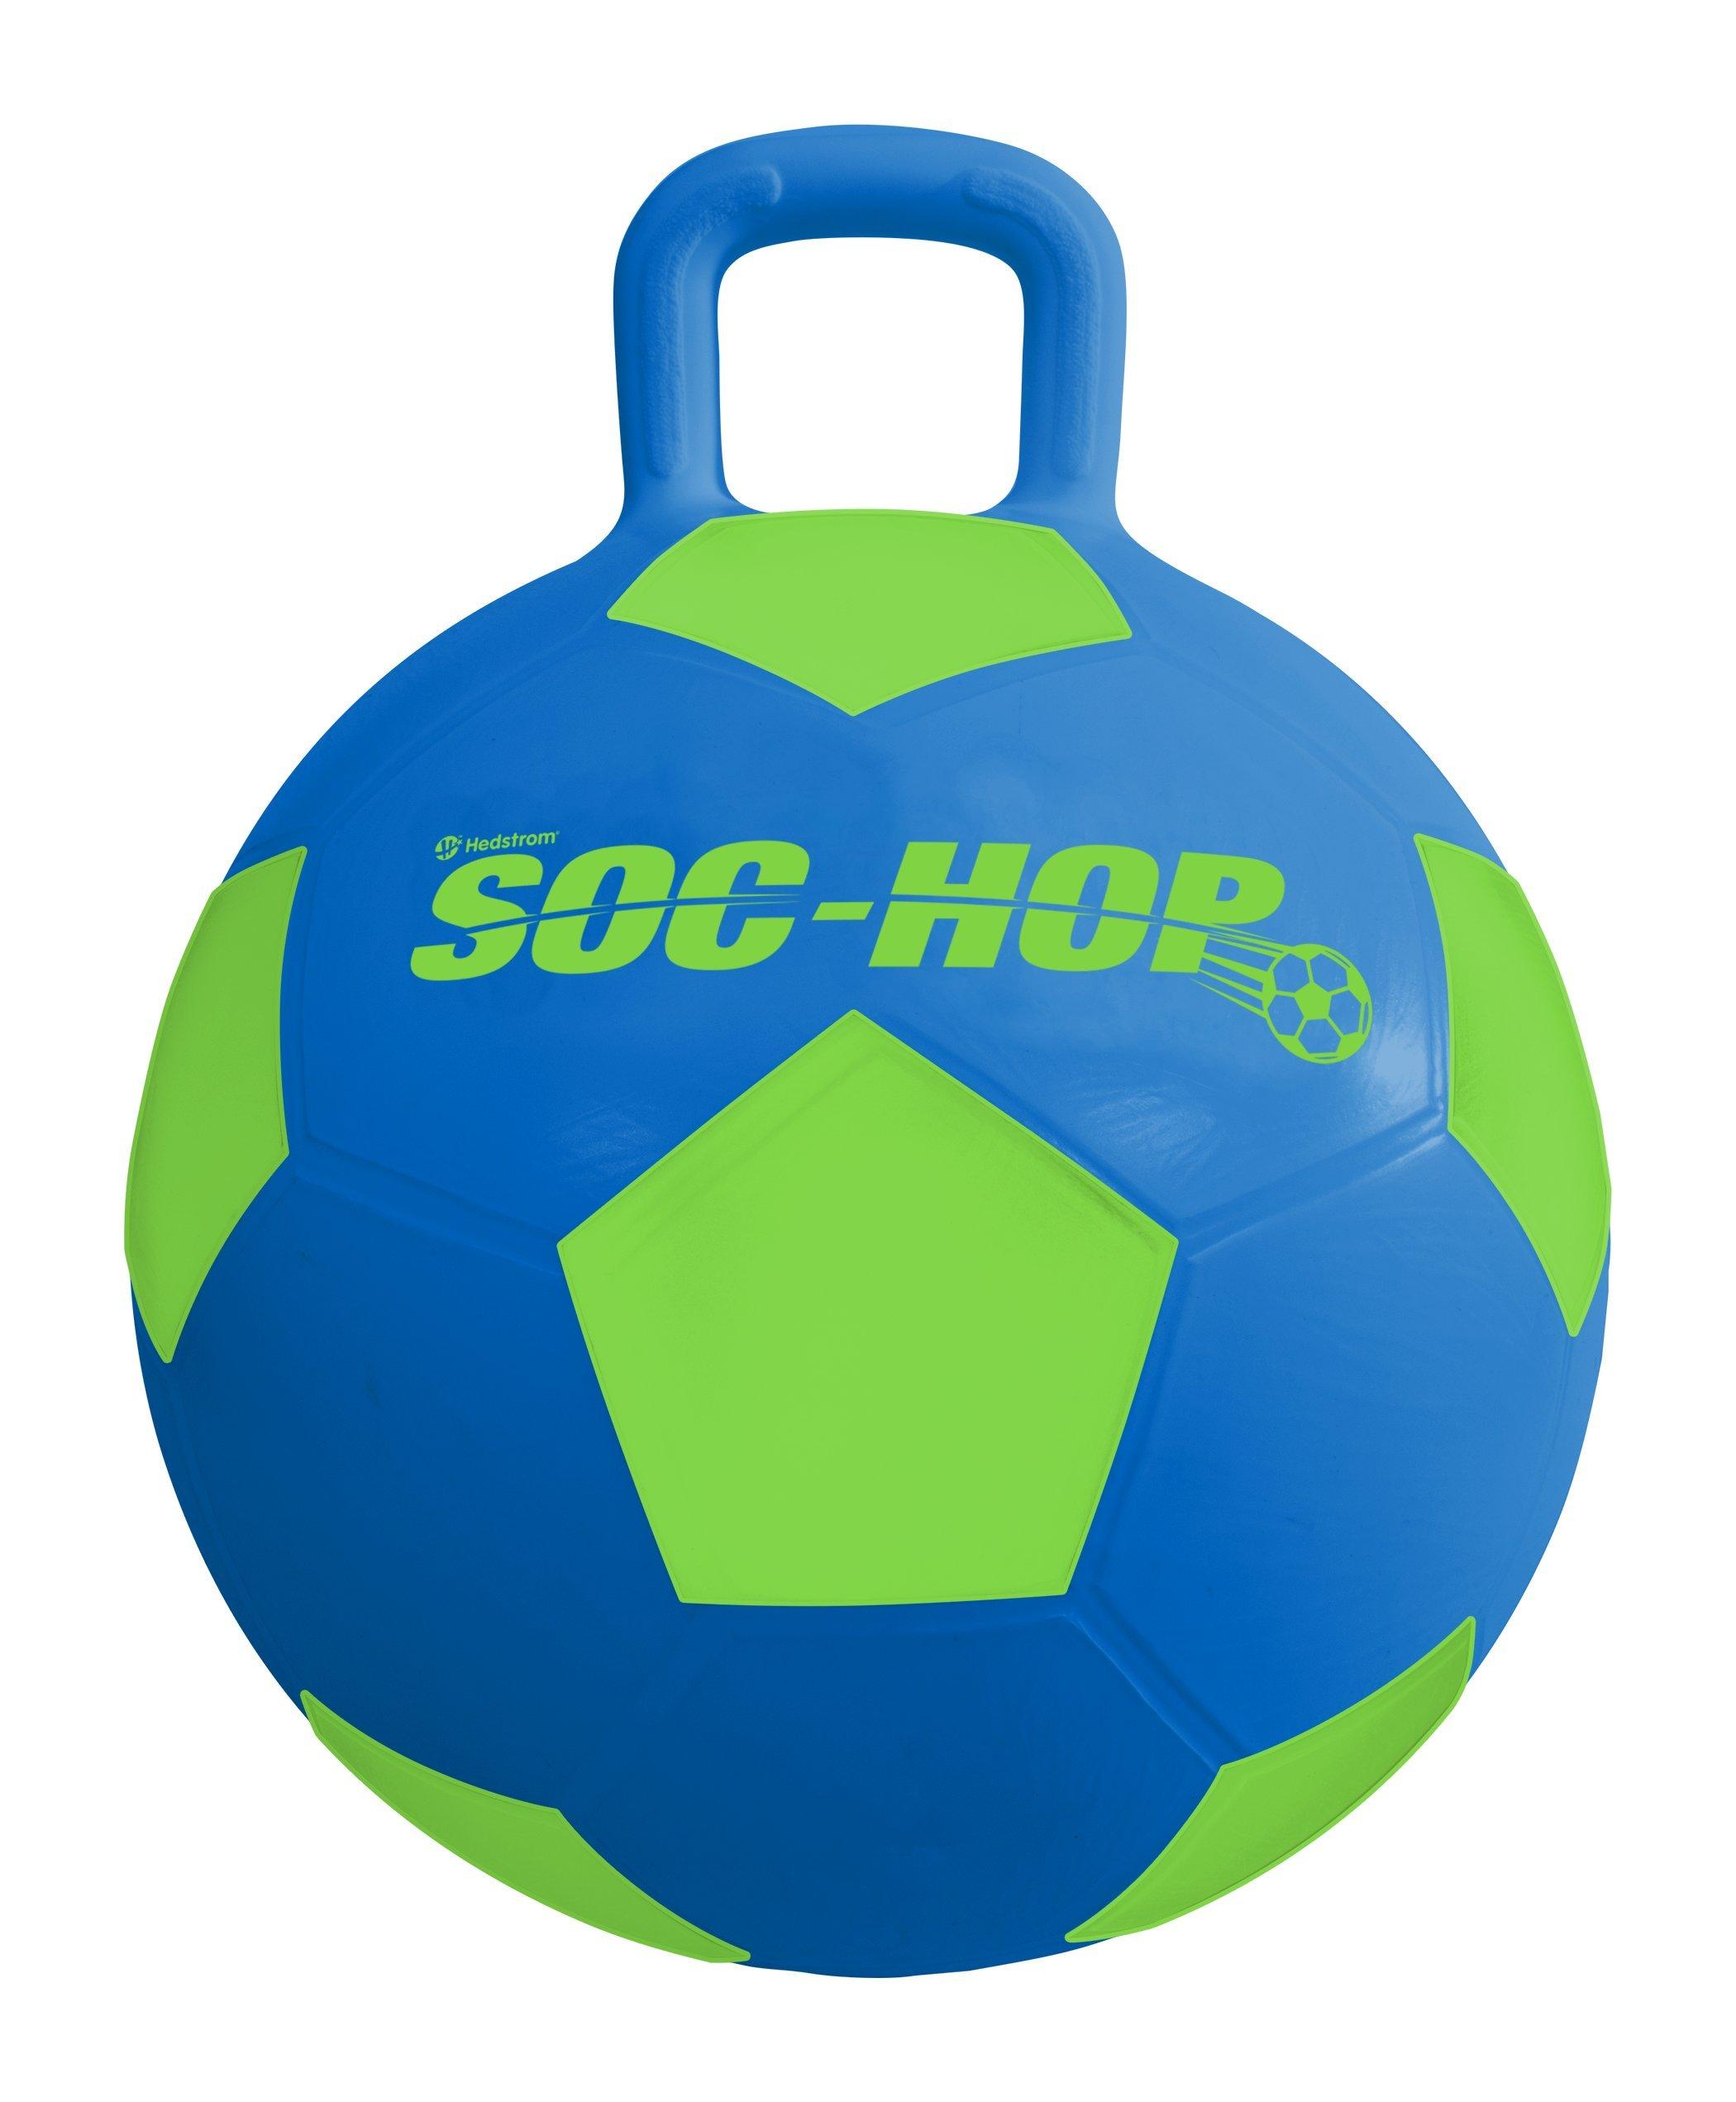 Hedstrom 55-9534 Soc Hop (Soccer Ball Hopper), Blue/Green, 15 Inch